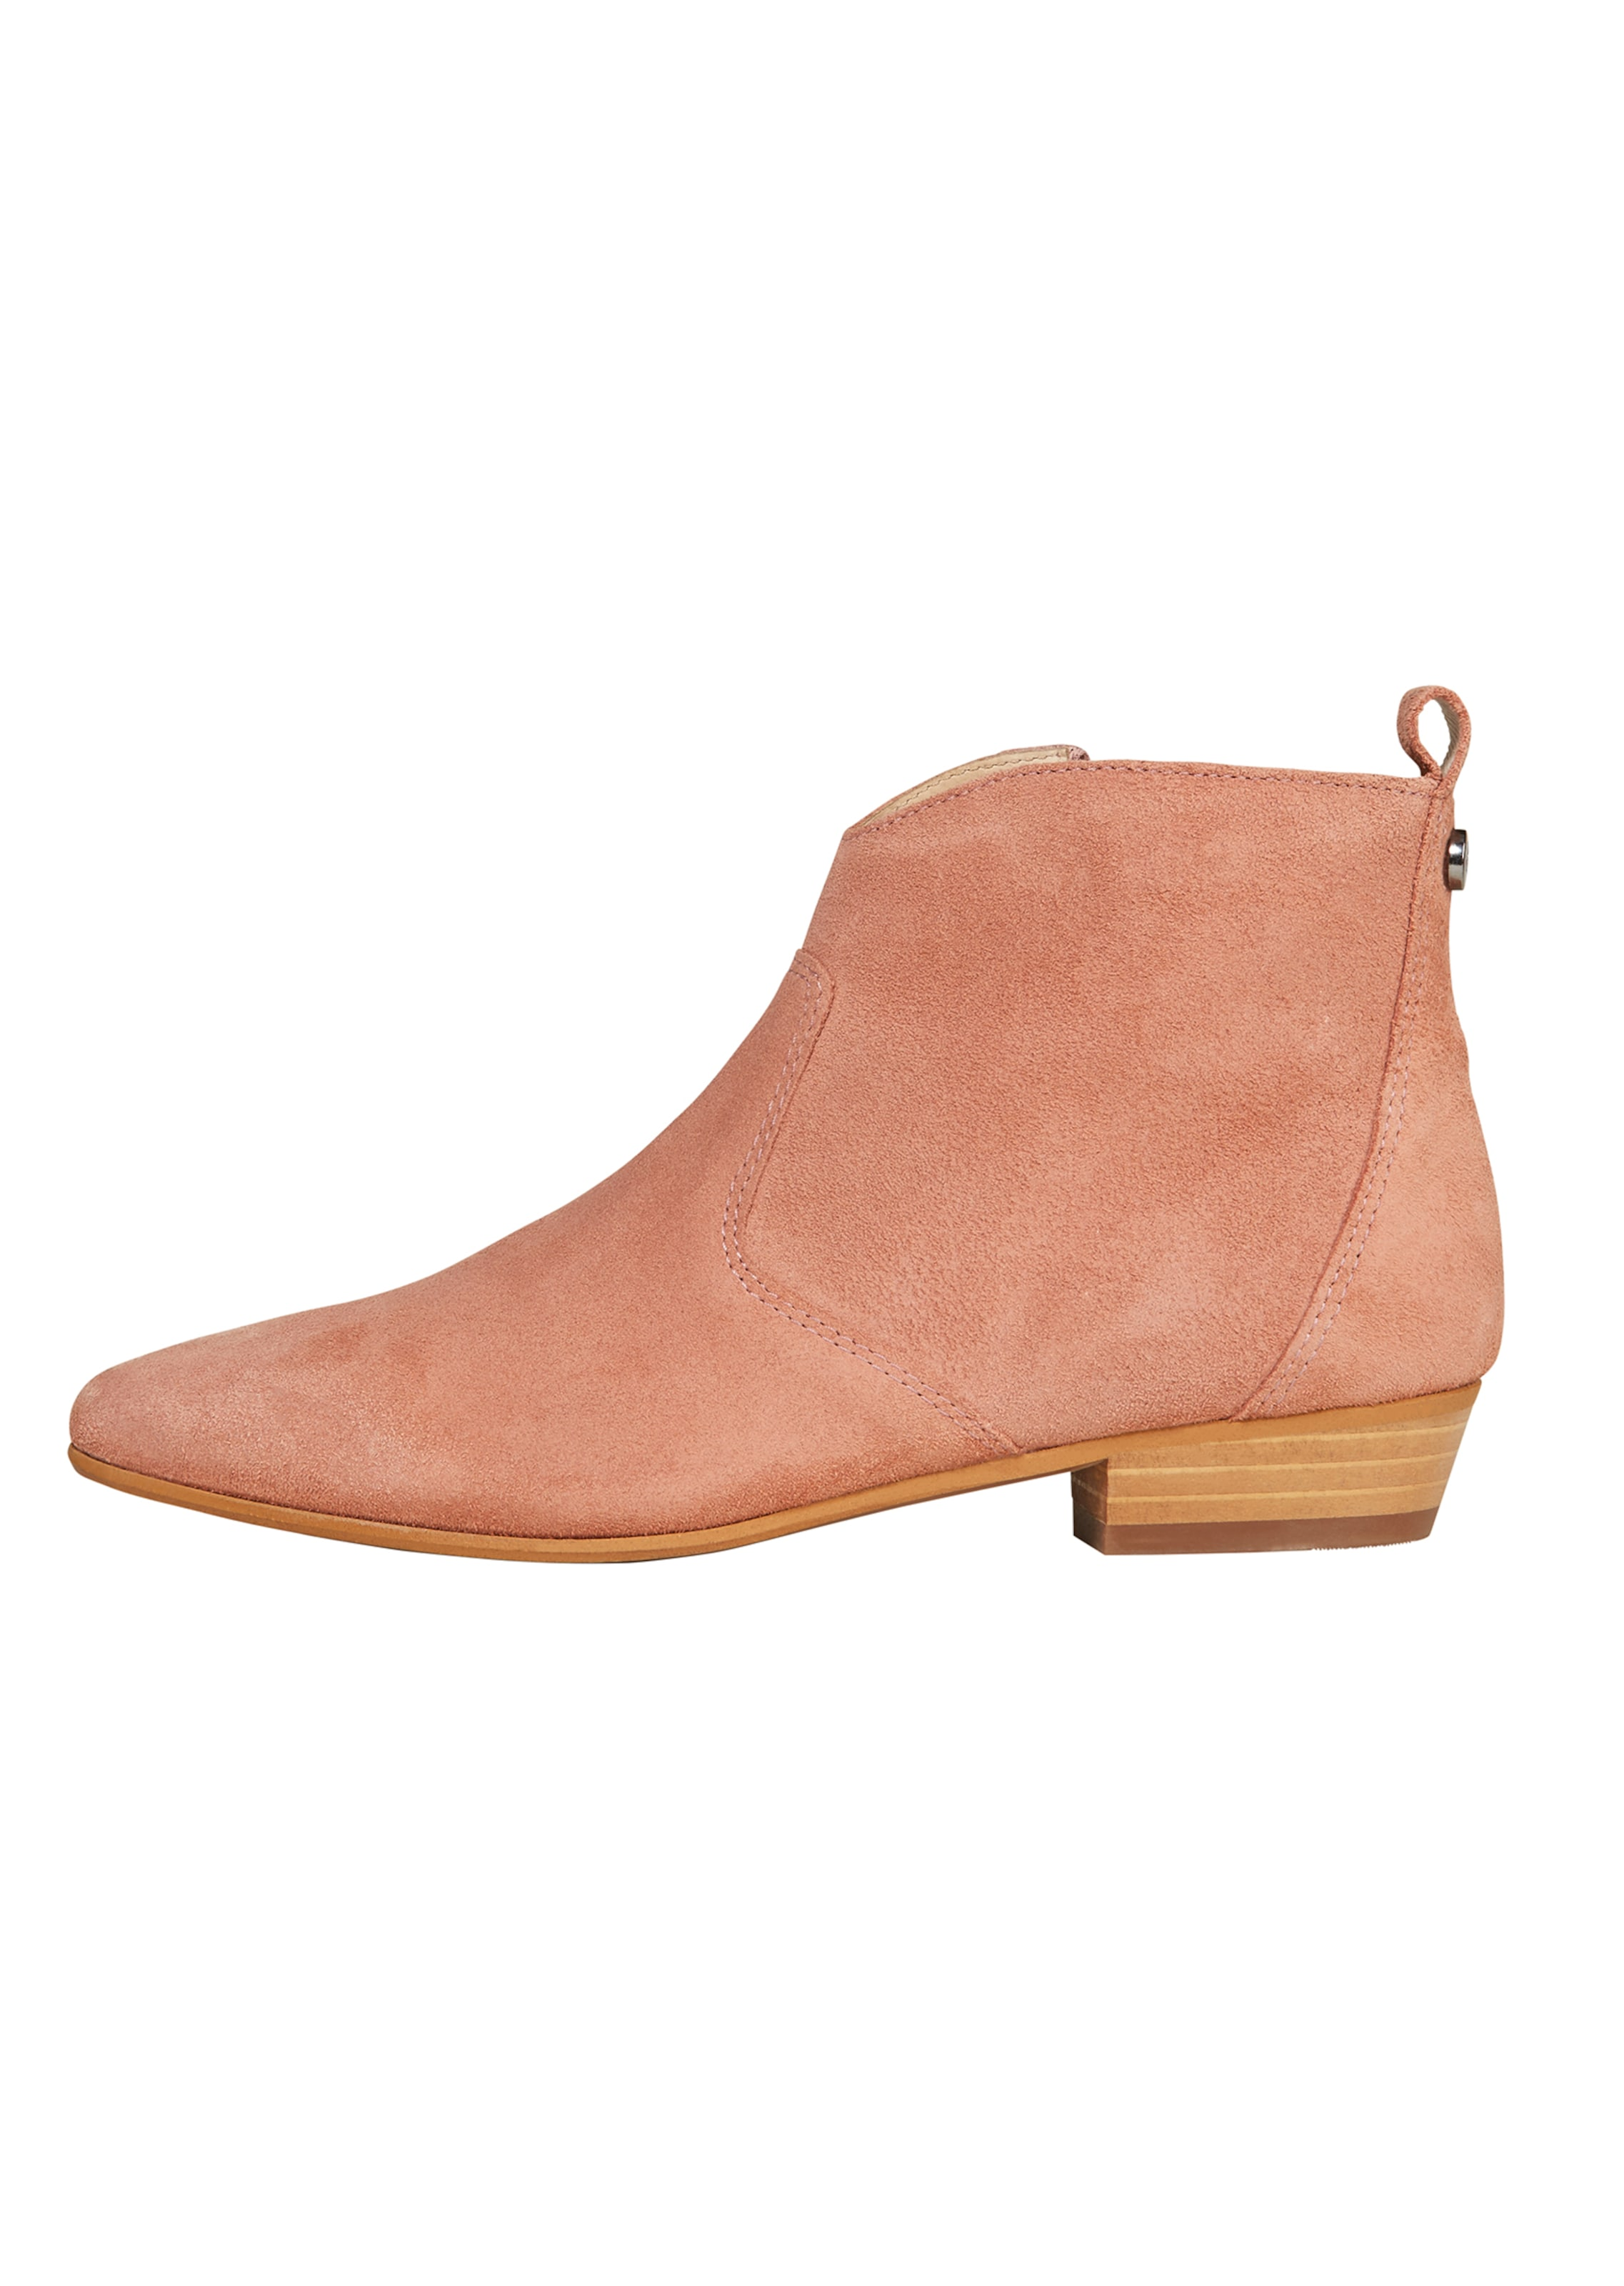 Haltbare Mode | billige Schuhe Marc O'Polo | Mode Ankleboots Schuhe Gut getragene Schuhe cfc42c